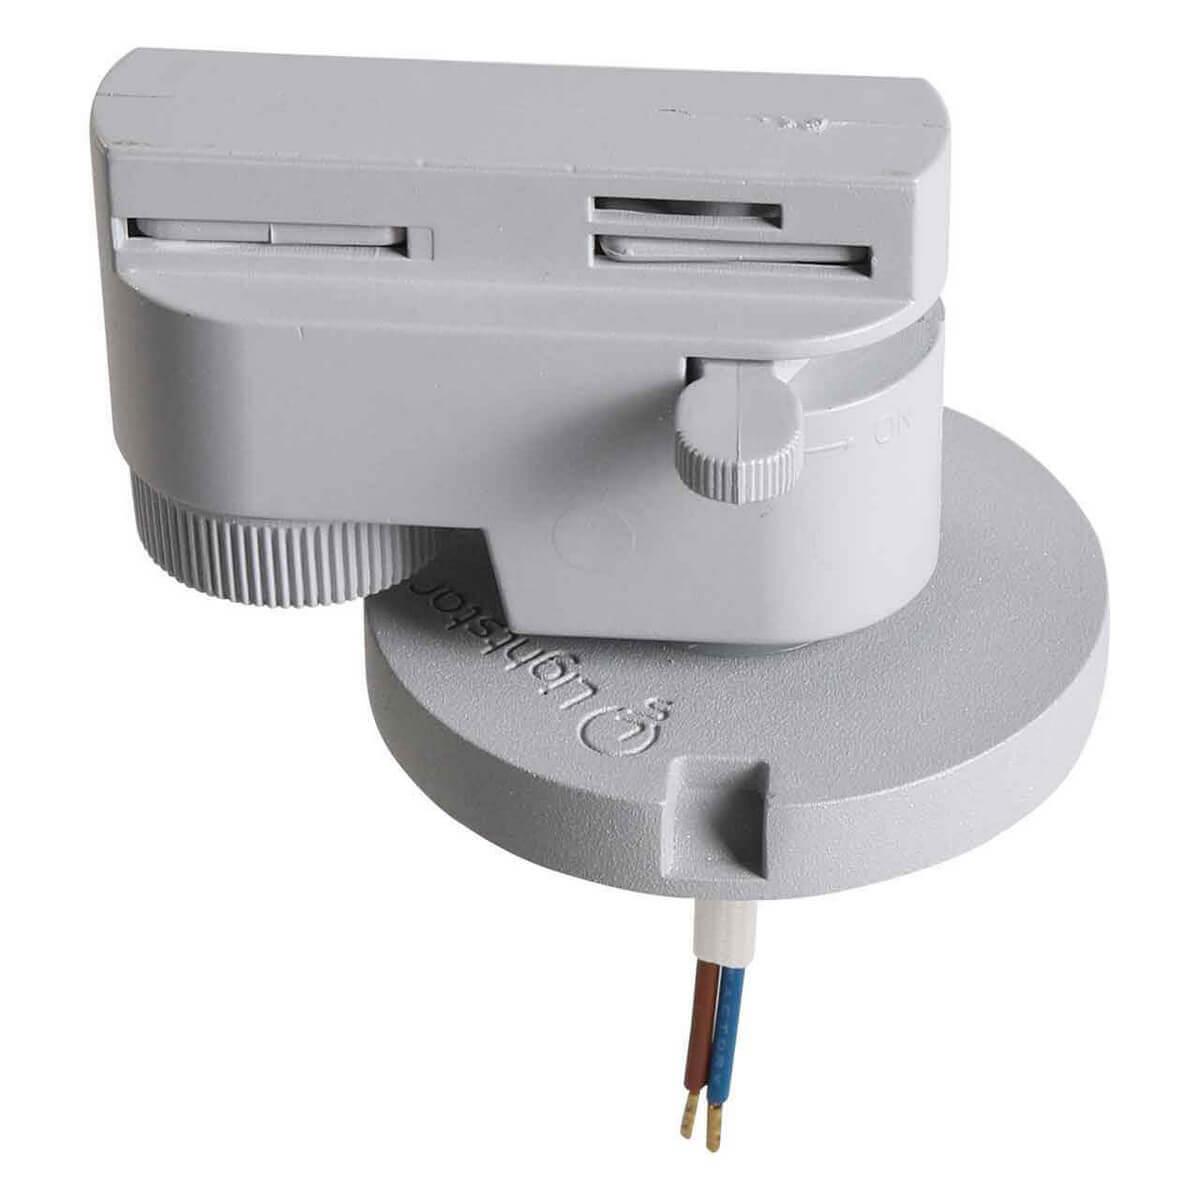 Адаптер для шинопровода Lightstar 592079 Asta Gray (для однофазного шинопровода)